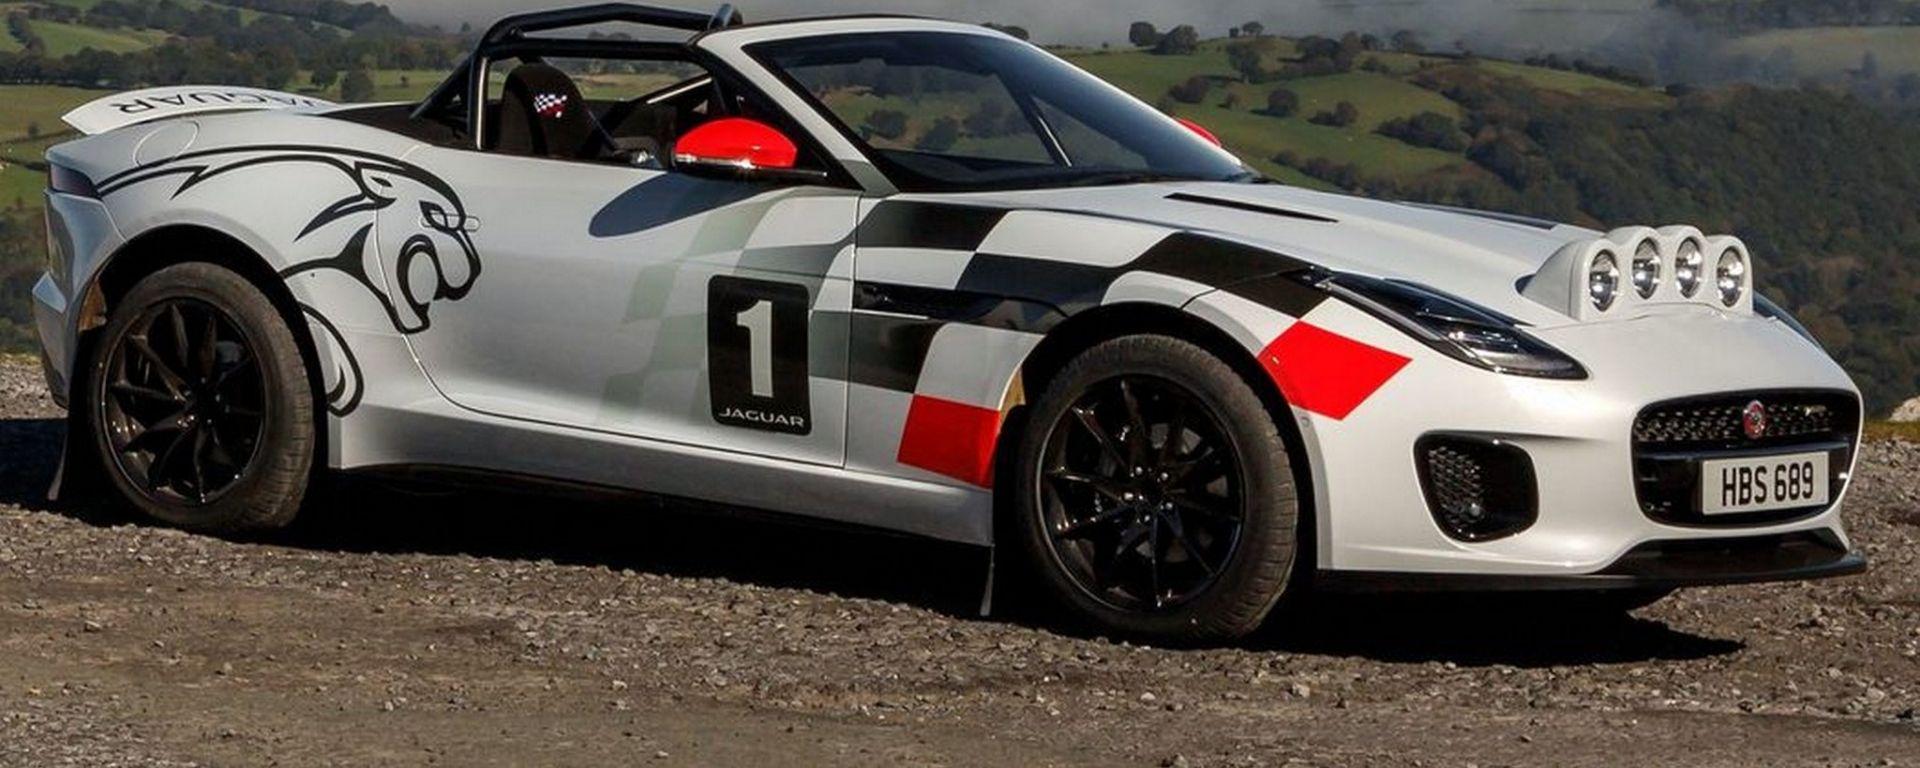 Jaguar F-Type Rally: il Giaguaro è pronto per i rally